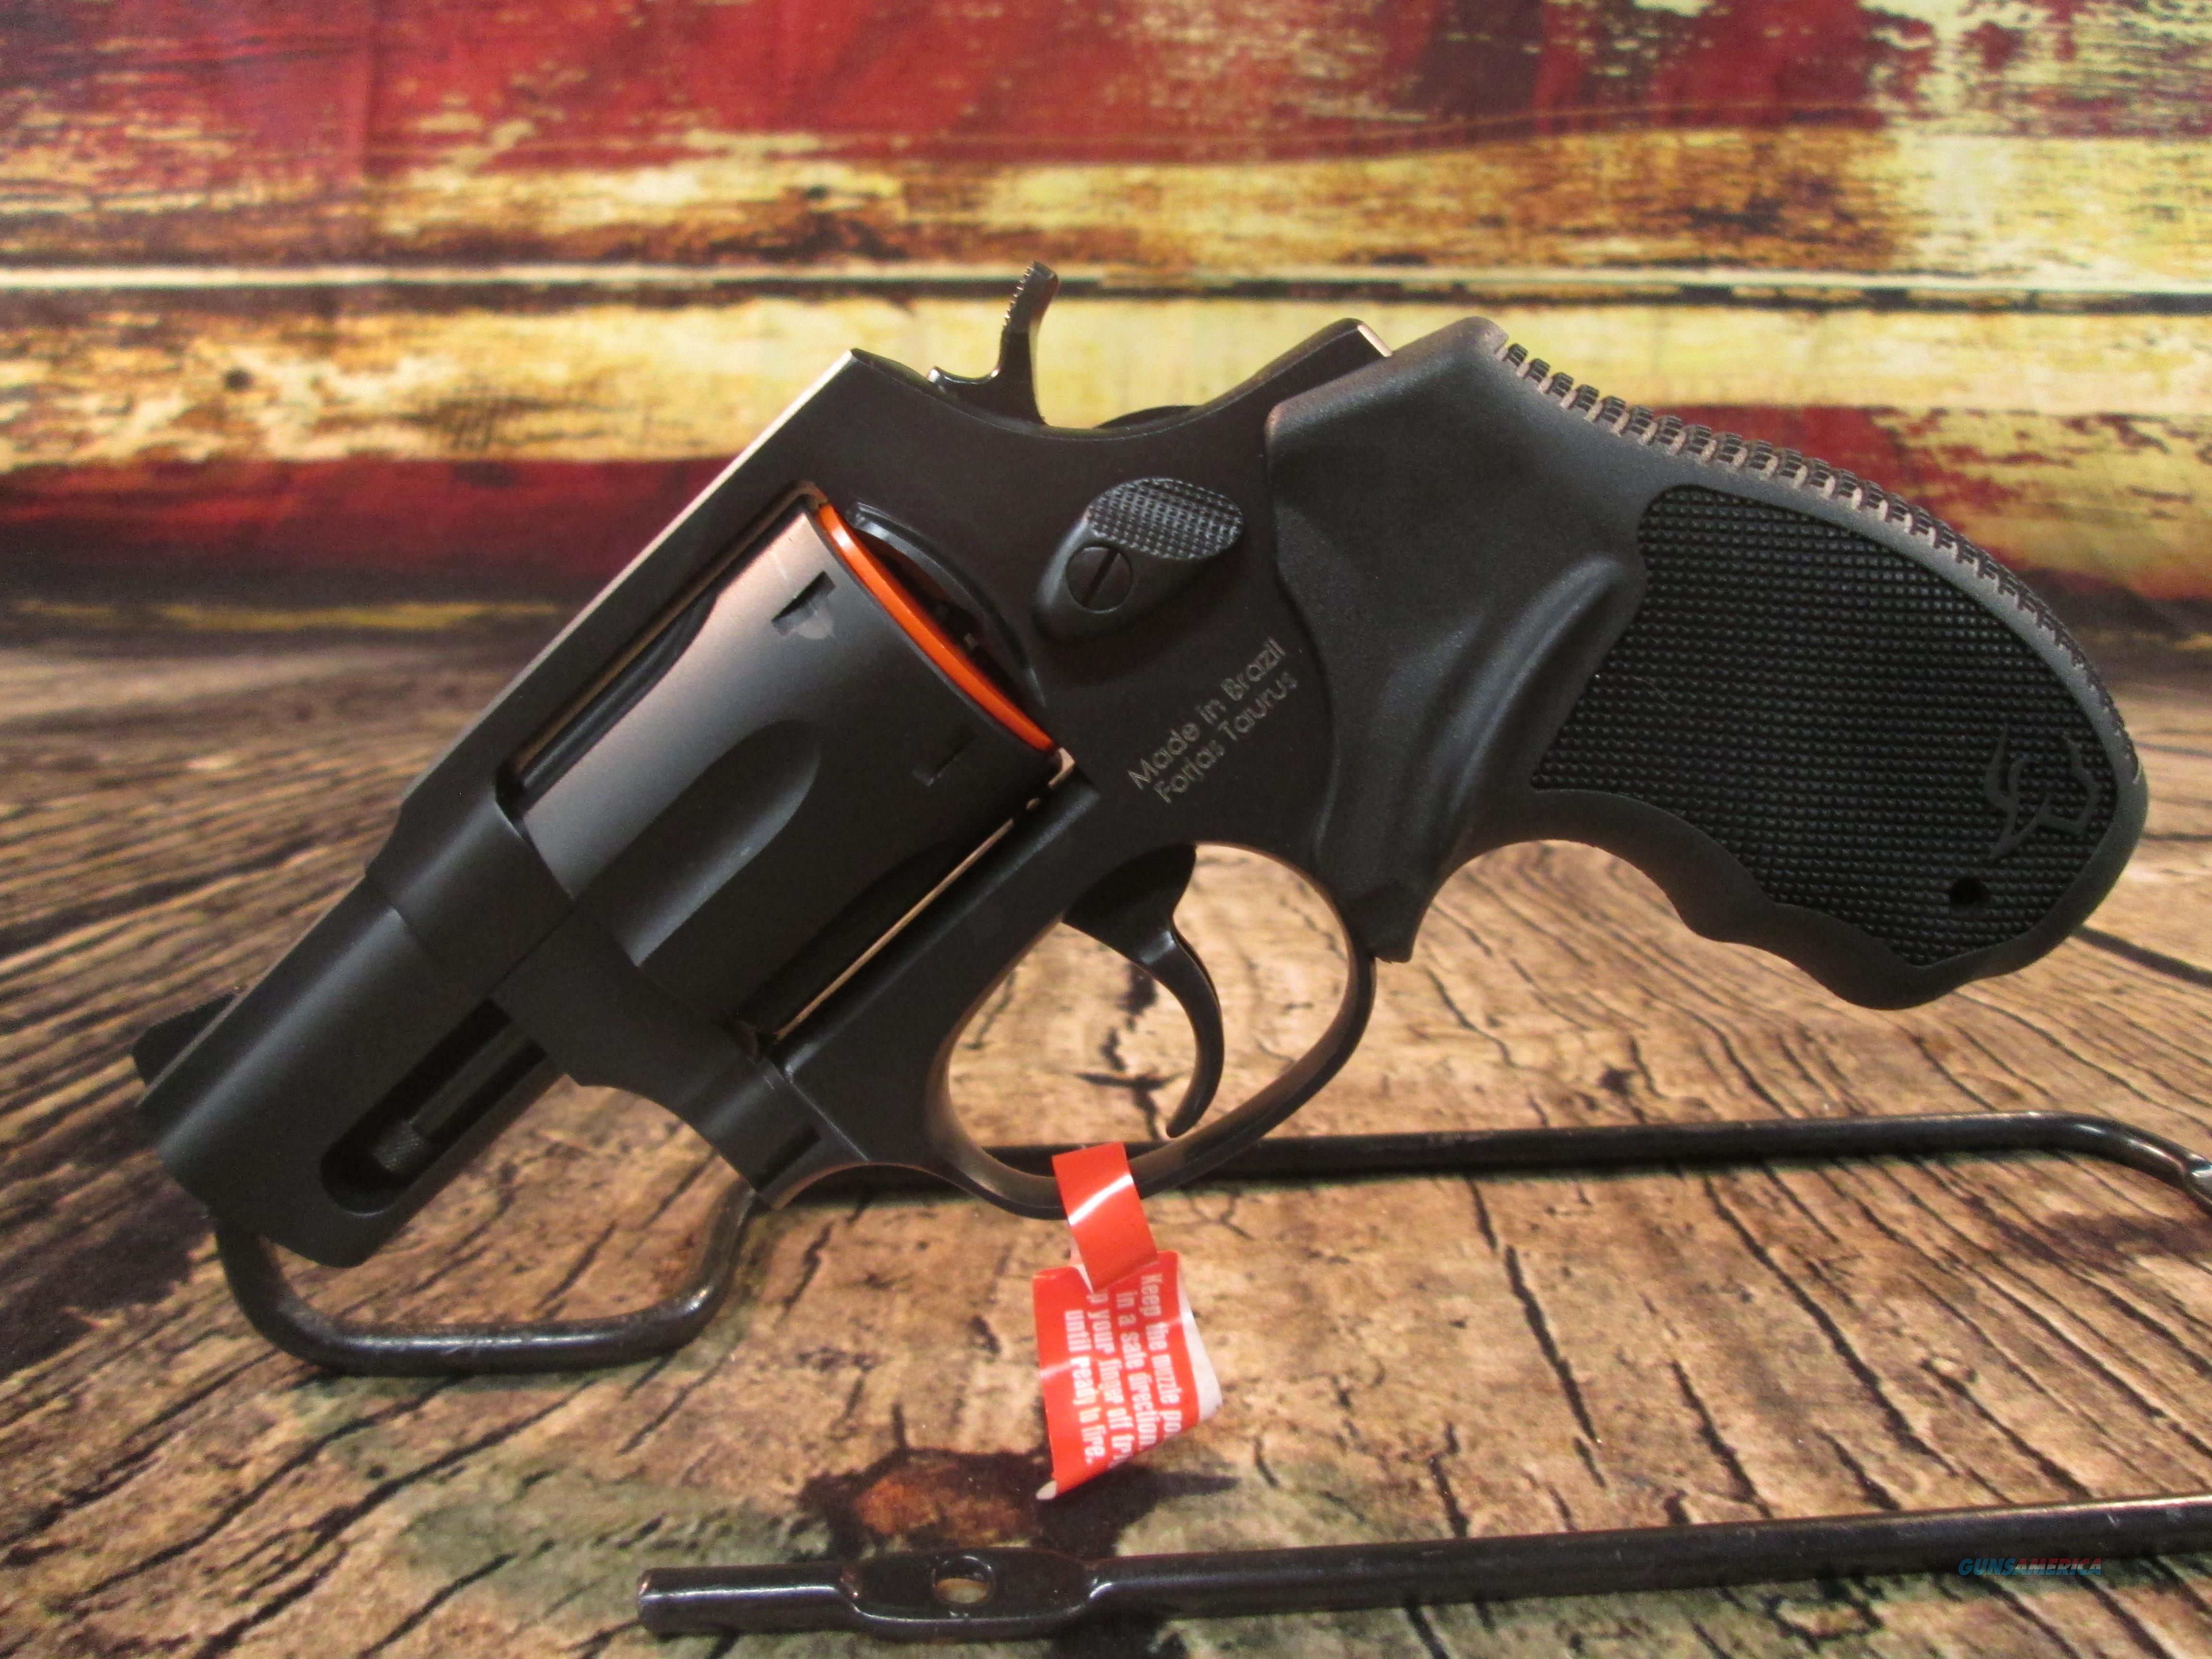 TAURUS 856 MATTE BLACK .38 SPL +P (2-856021M) $$ FACTORY REBATE OFFER $$  Guns > Pistols > Taurus Pistols > Revolvers